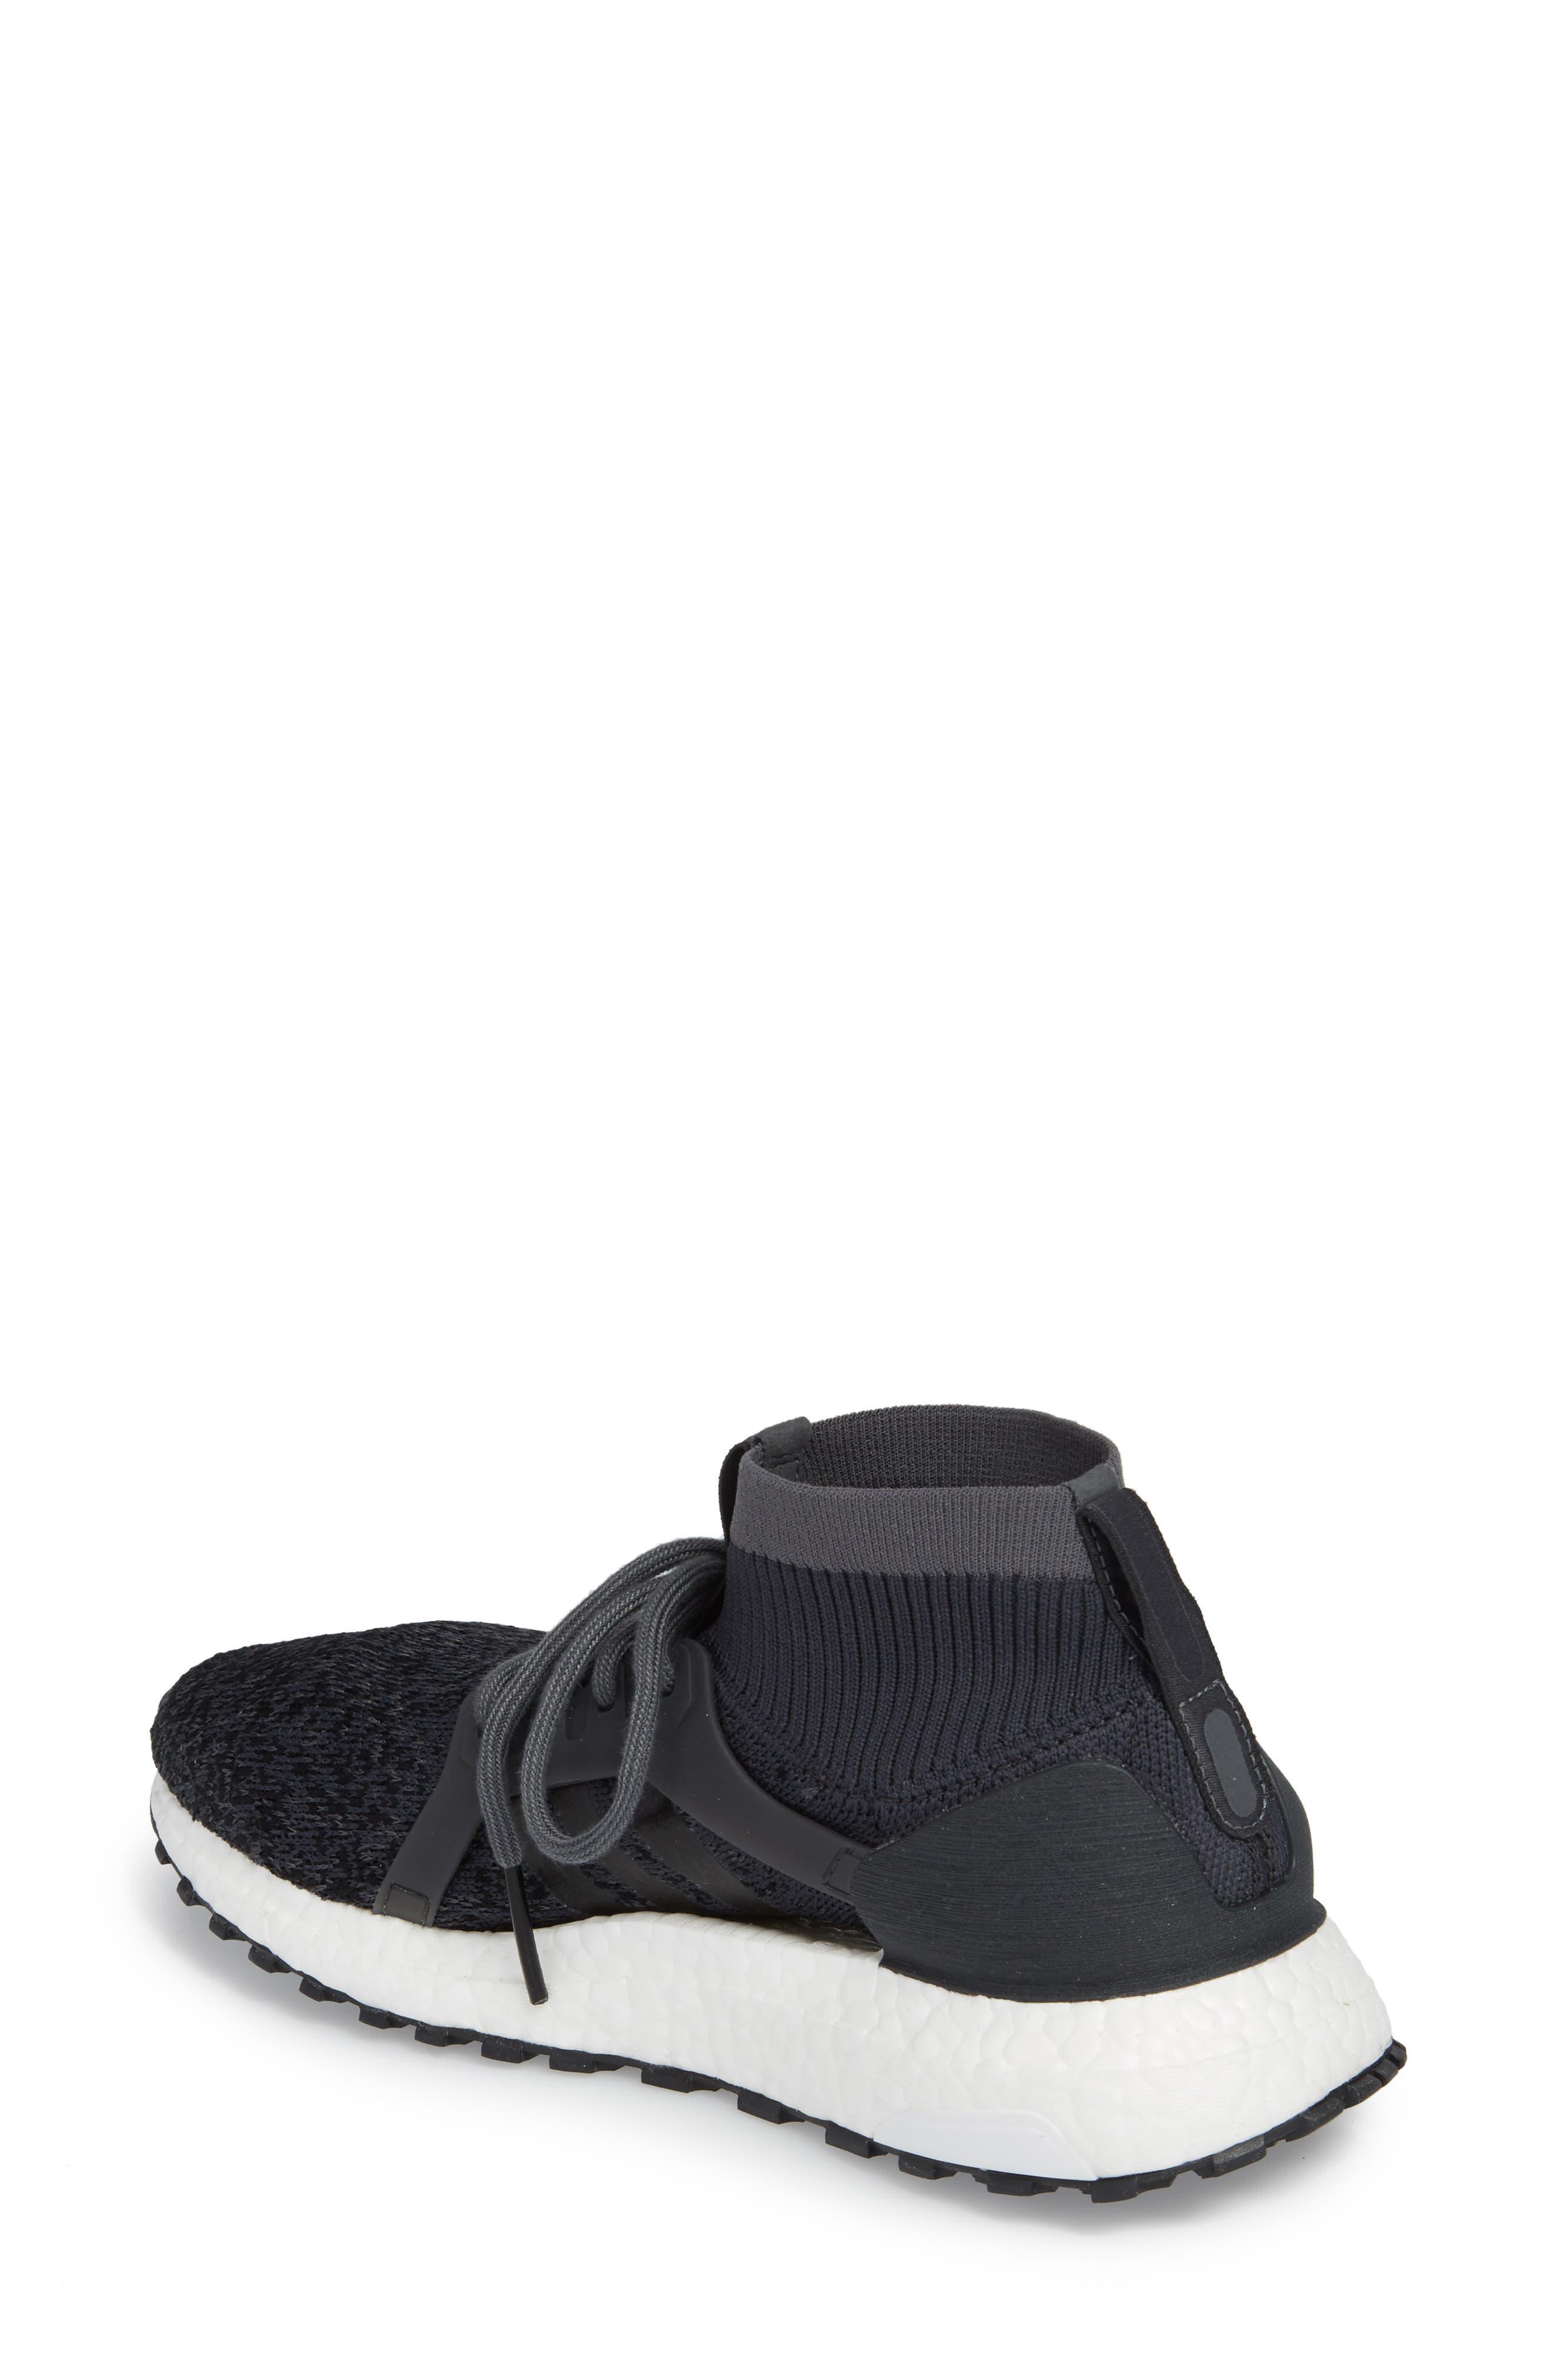 Alternate Image 2  - adidas UltraBoost X All Terrain Water Resistant Running Shoe (Women)